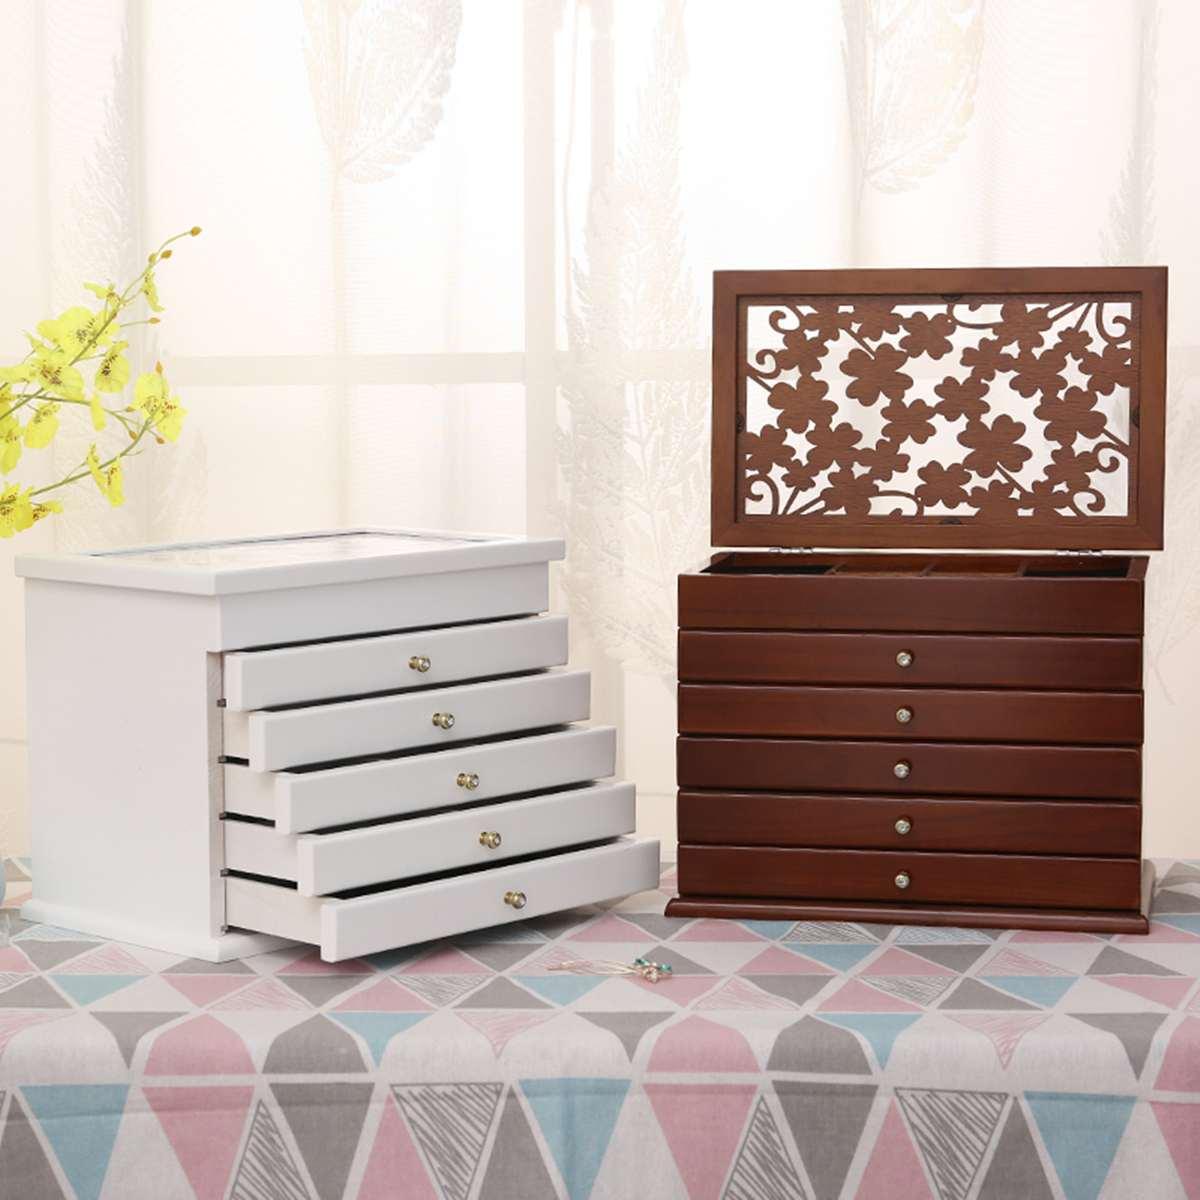 Joyero de madera de múltiples capas hueco hacia fuera/con caja de exhibición de joyería de espejo Cajas De Anillo caja de regalo organizadora de joyería